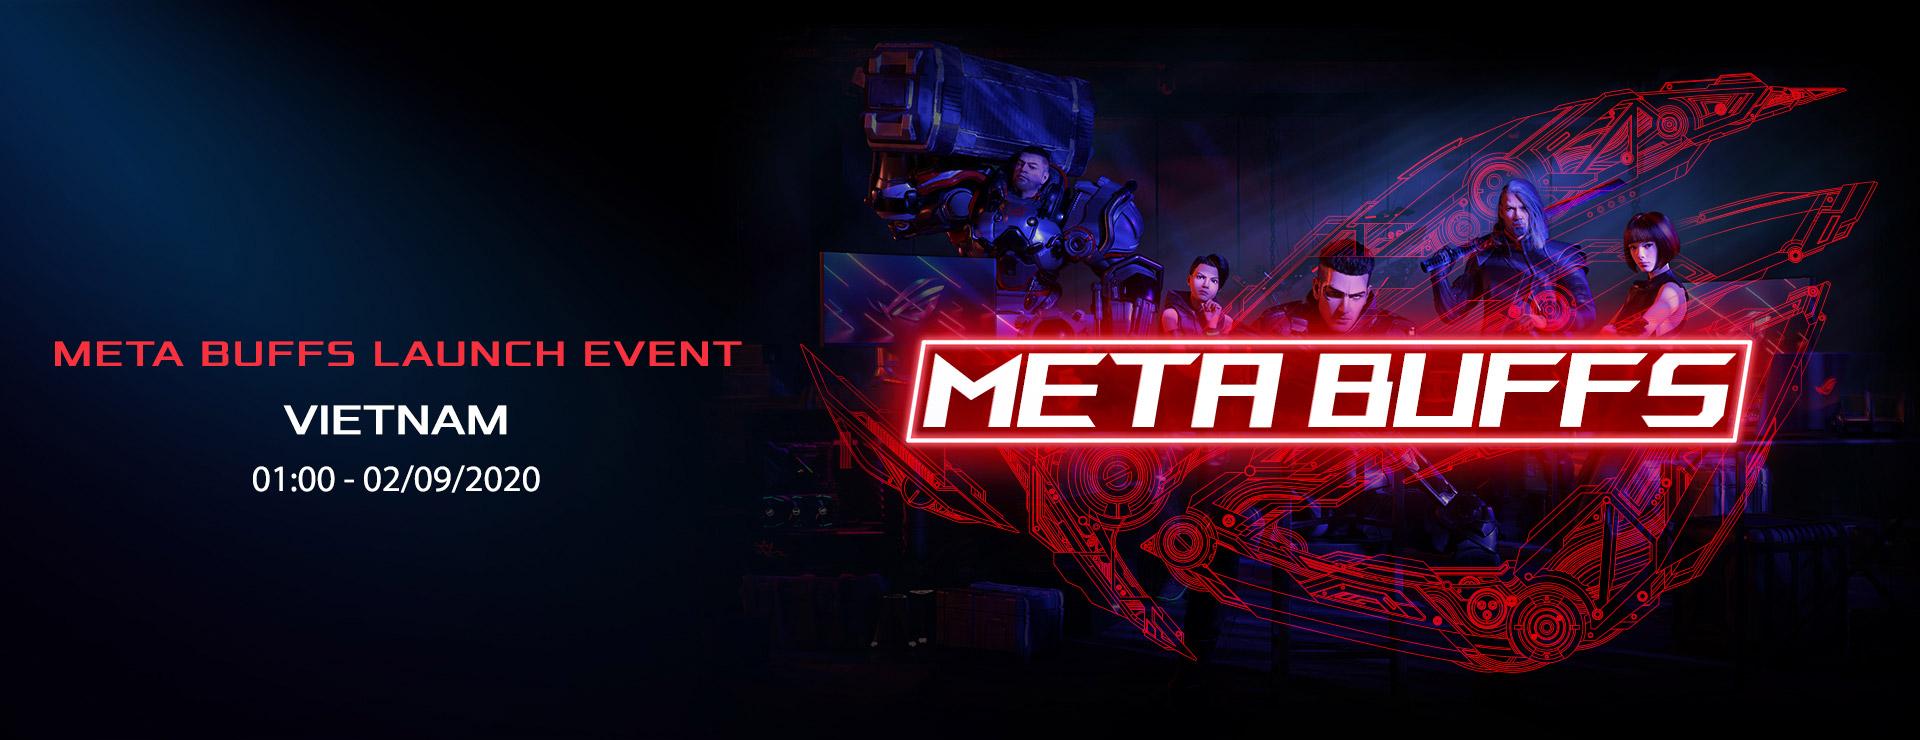 META BUFFS LAUNCH EVENT